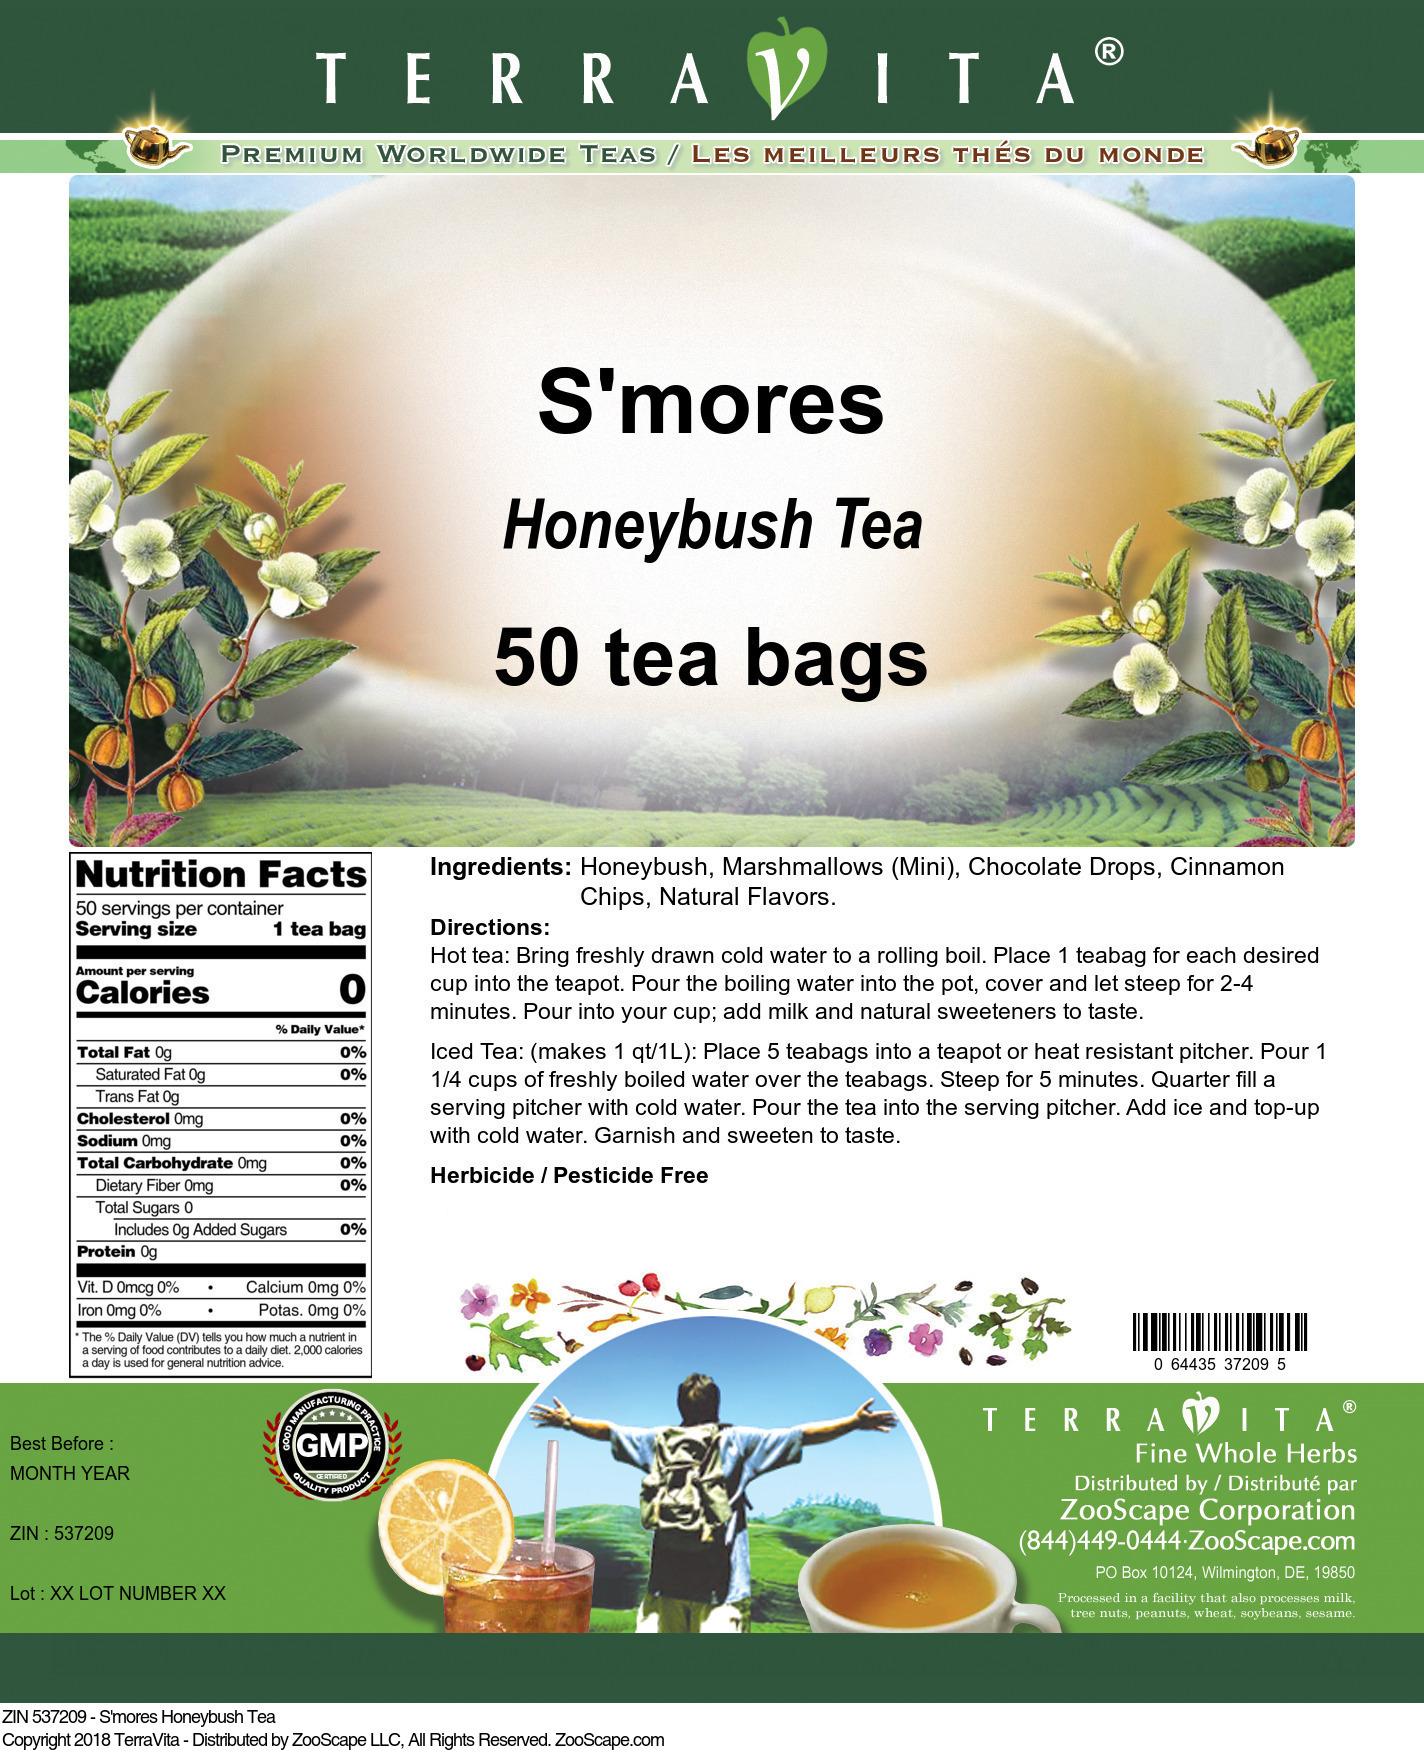 S'mores Honeybush Tea